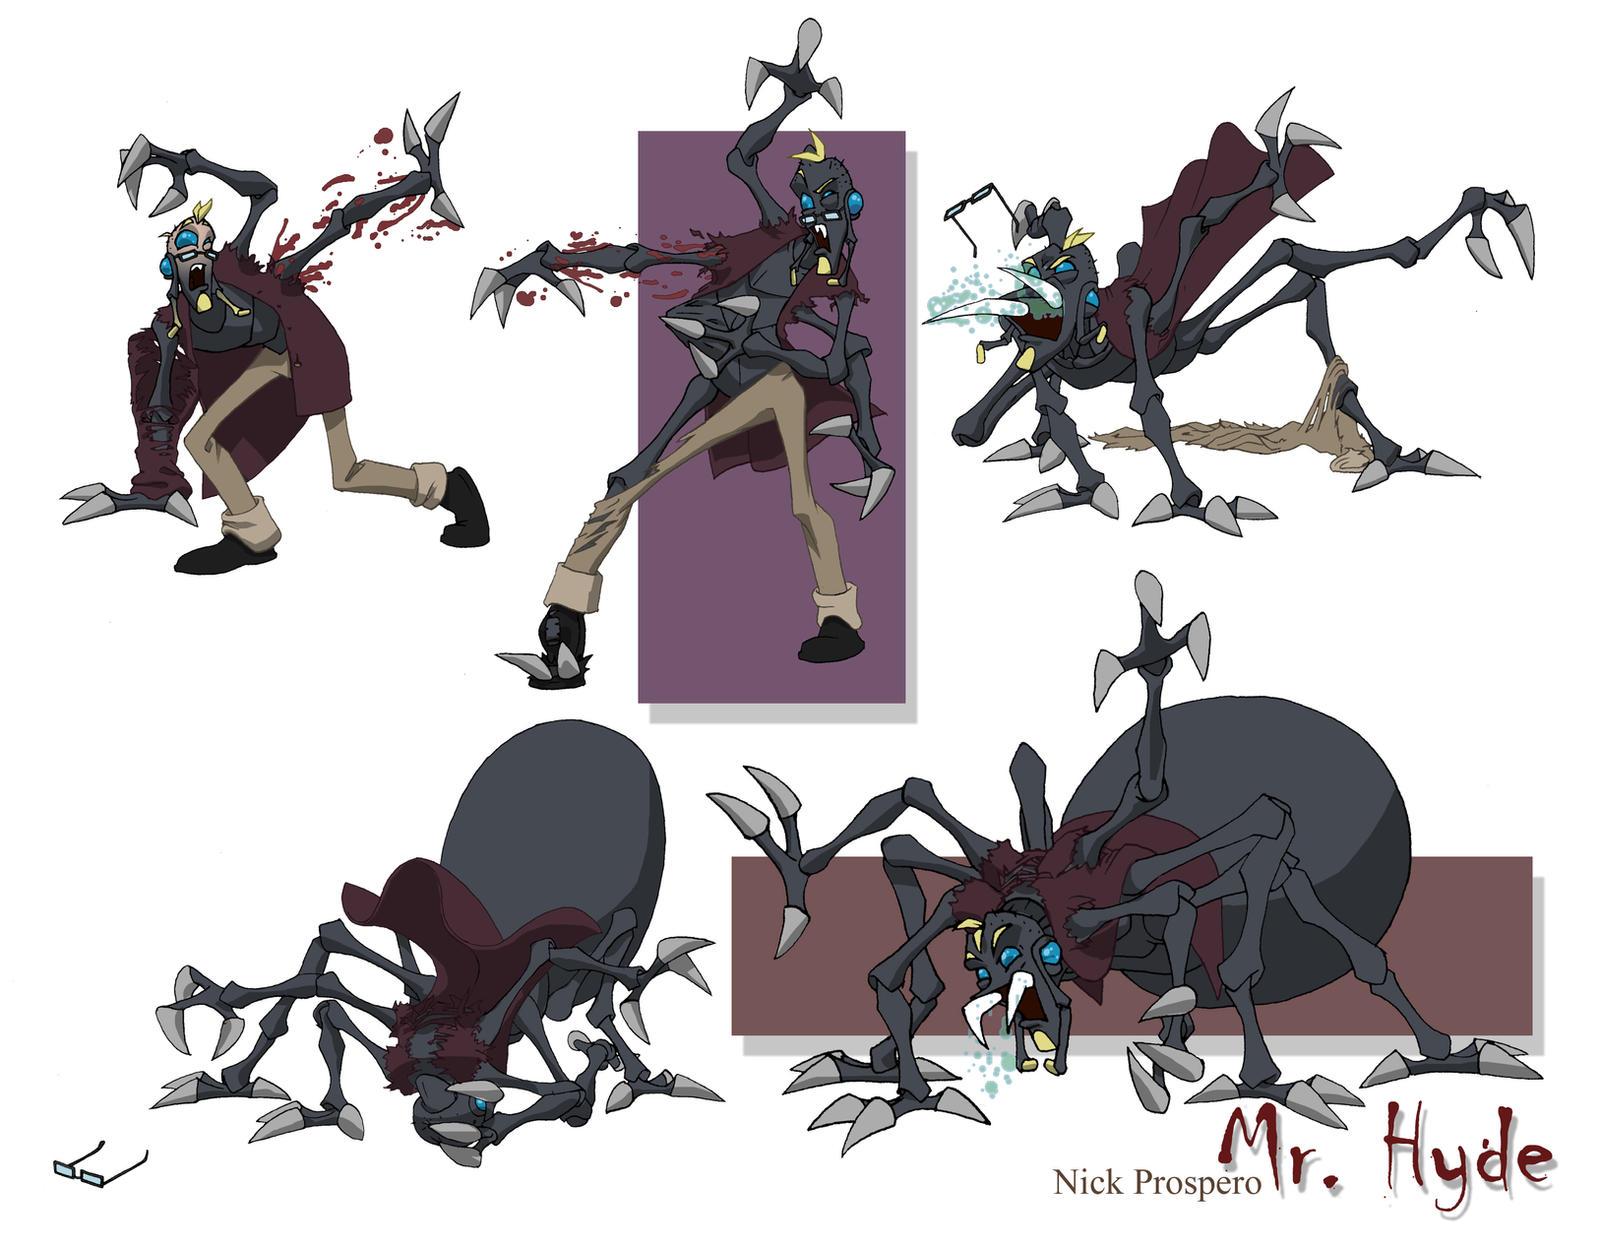 Pagemaster Dr Jekyll: Dr. Jekyll To Mr. Hyde 2 By Cosmic0ne On DeviantArt